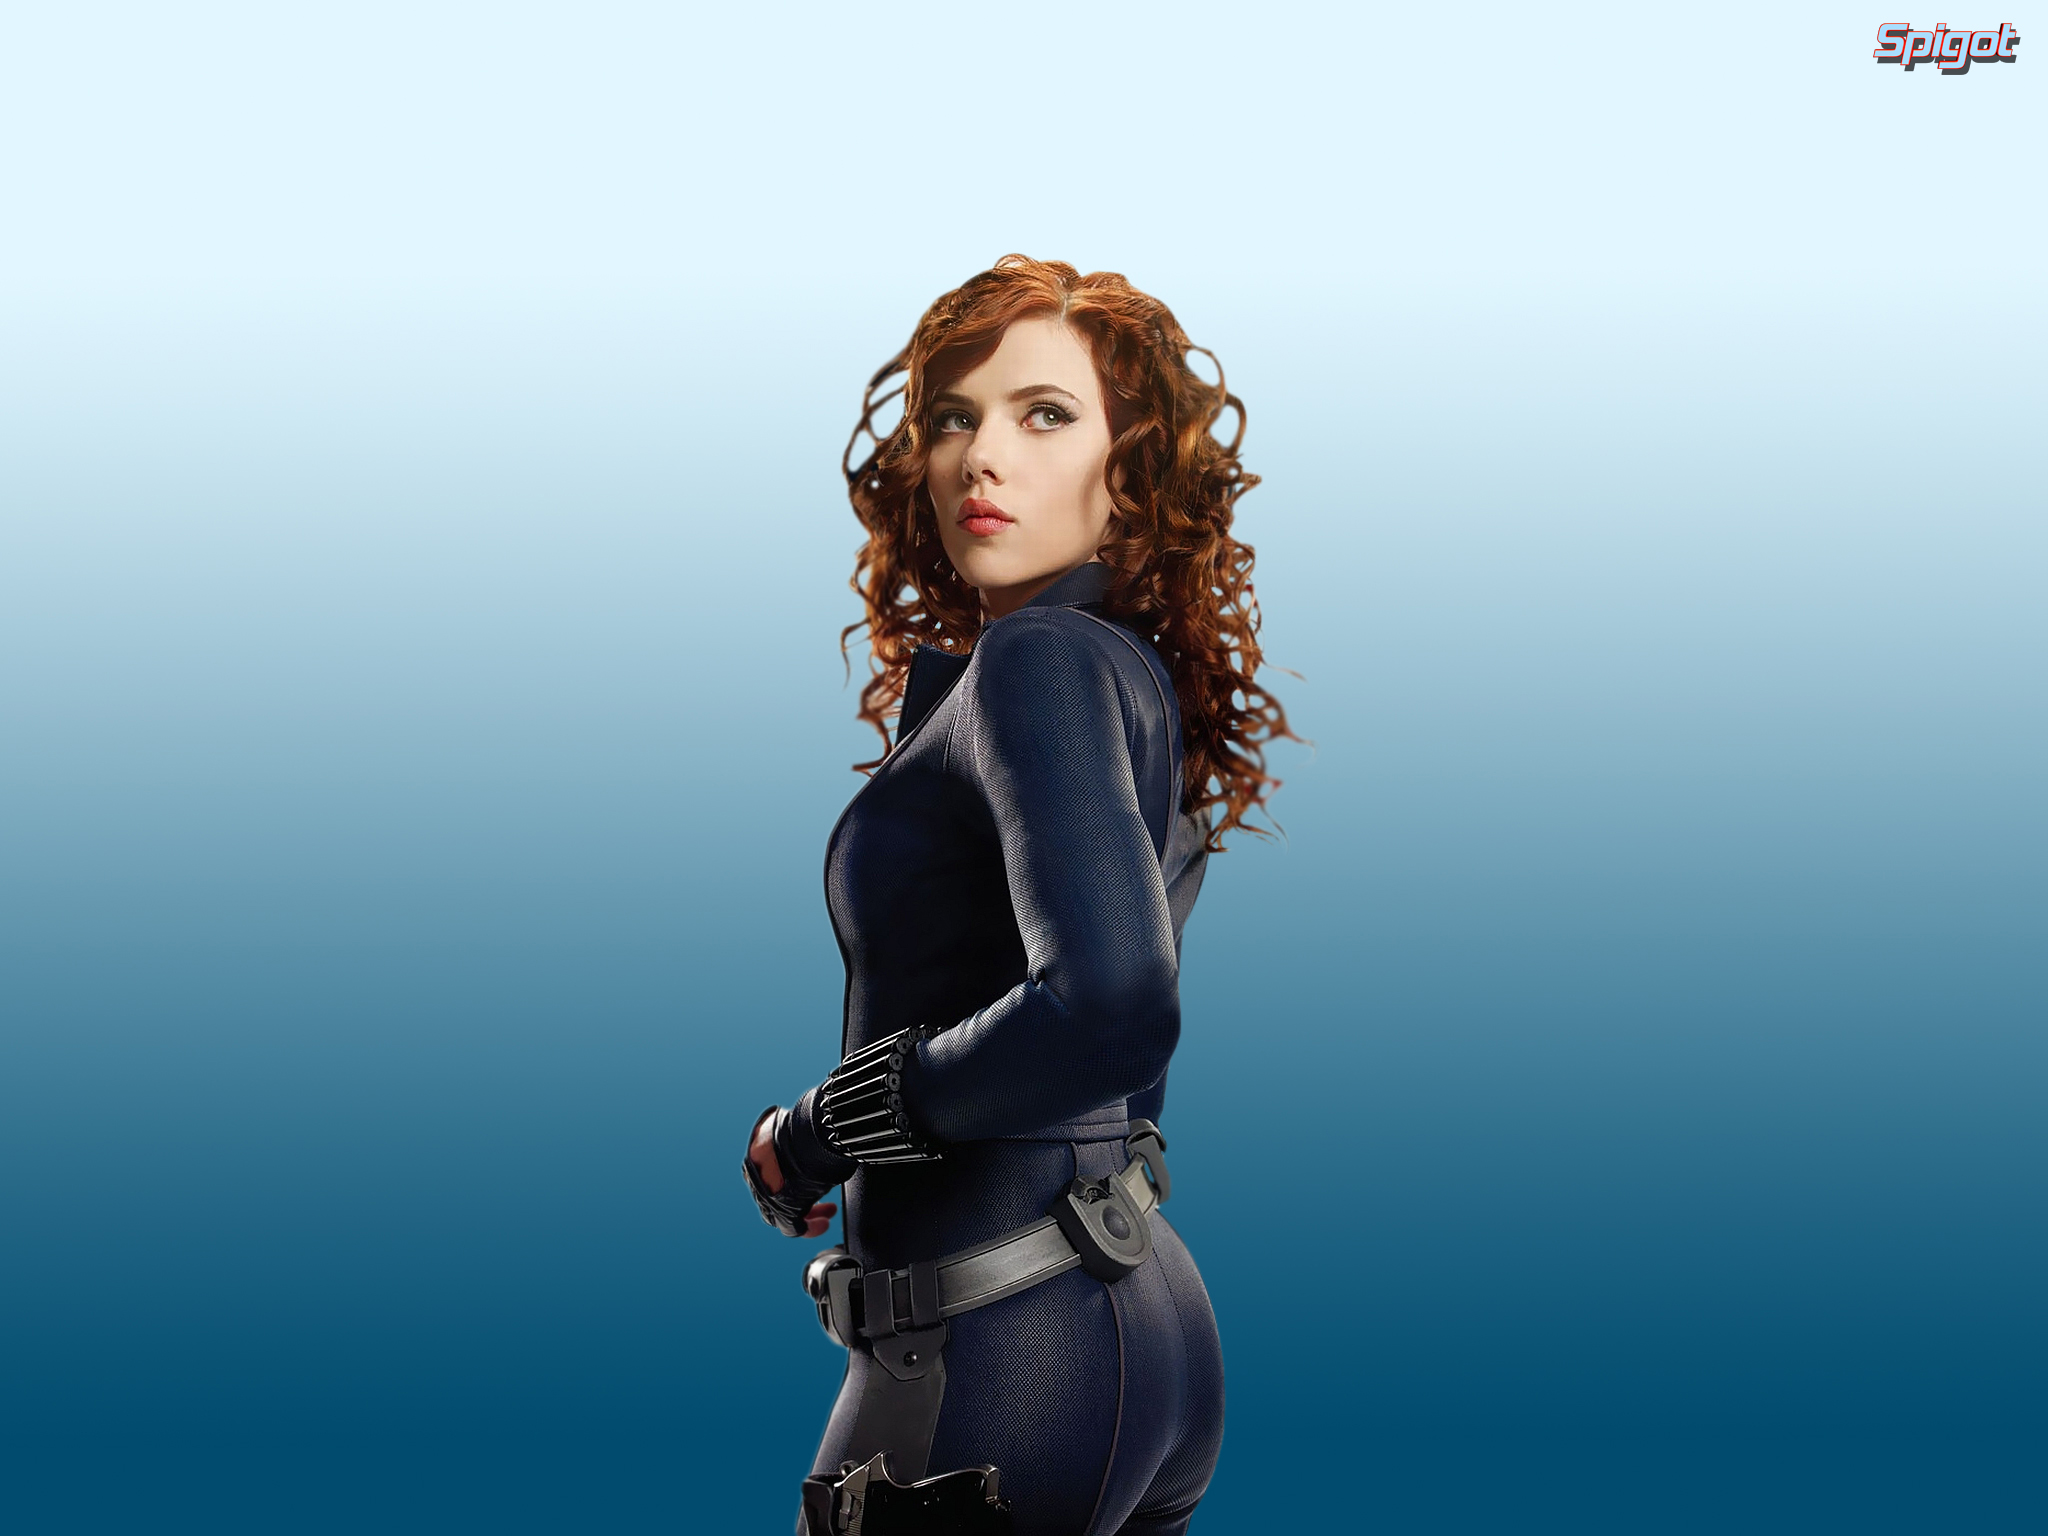 Black Widow Wallpaper 2048x1536 80195